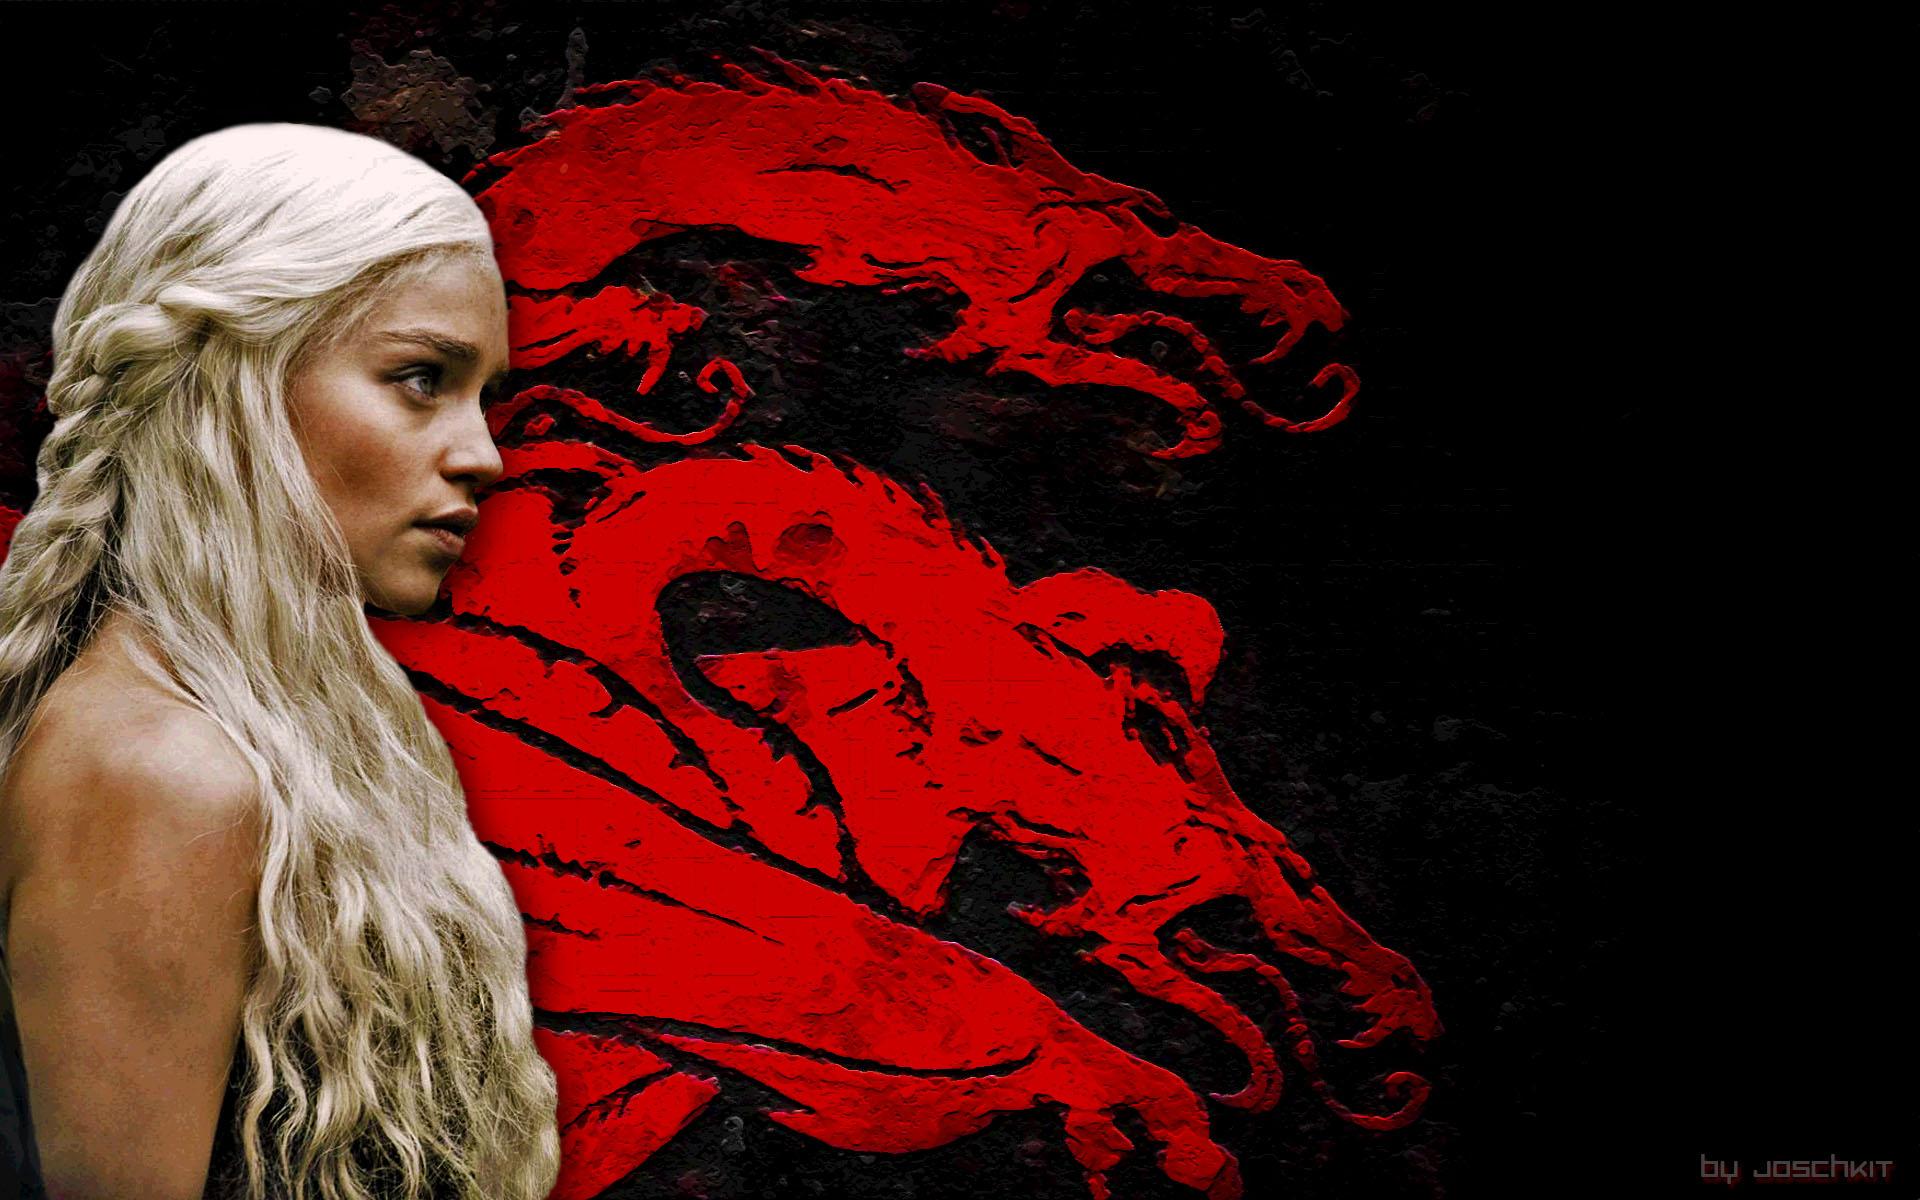 khaleesi wallpaper game - photo #21